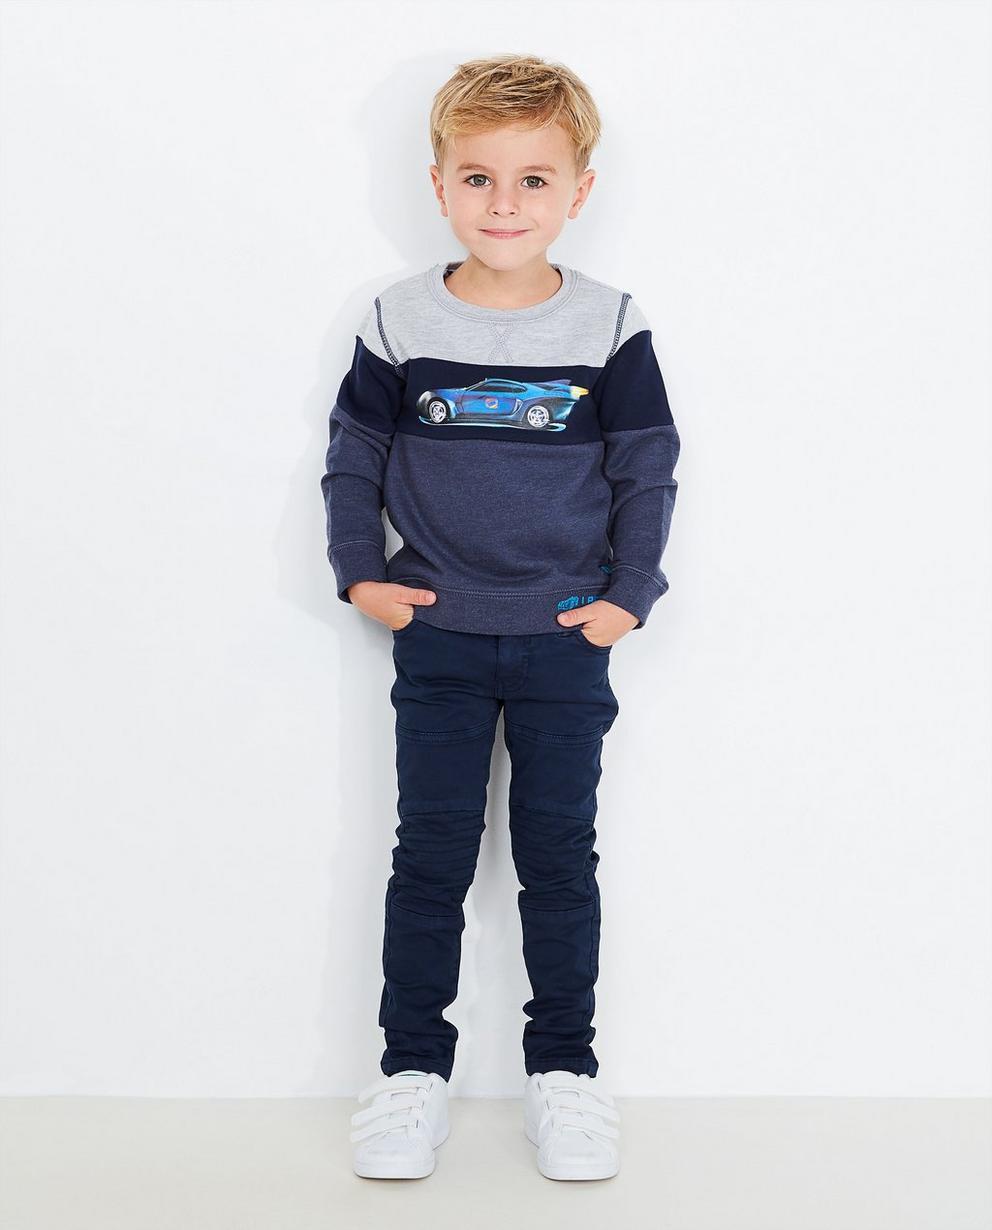 Pantalon cargo  - bleu marine, Rox - Rox